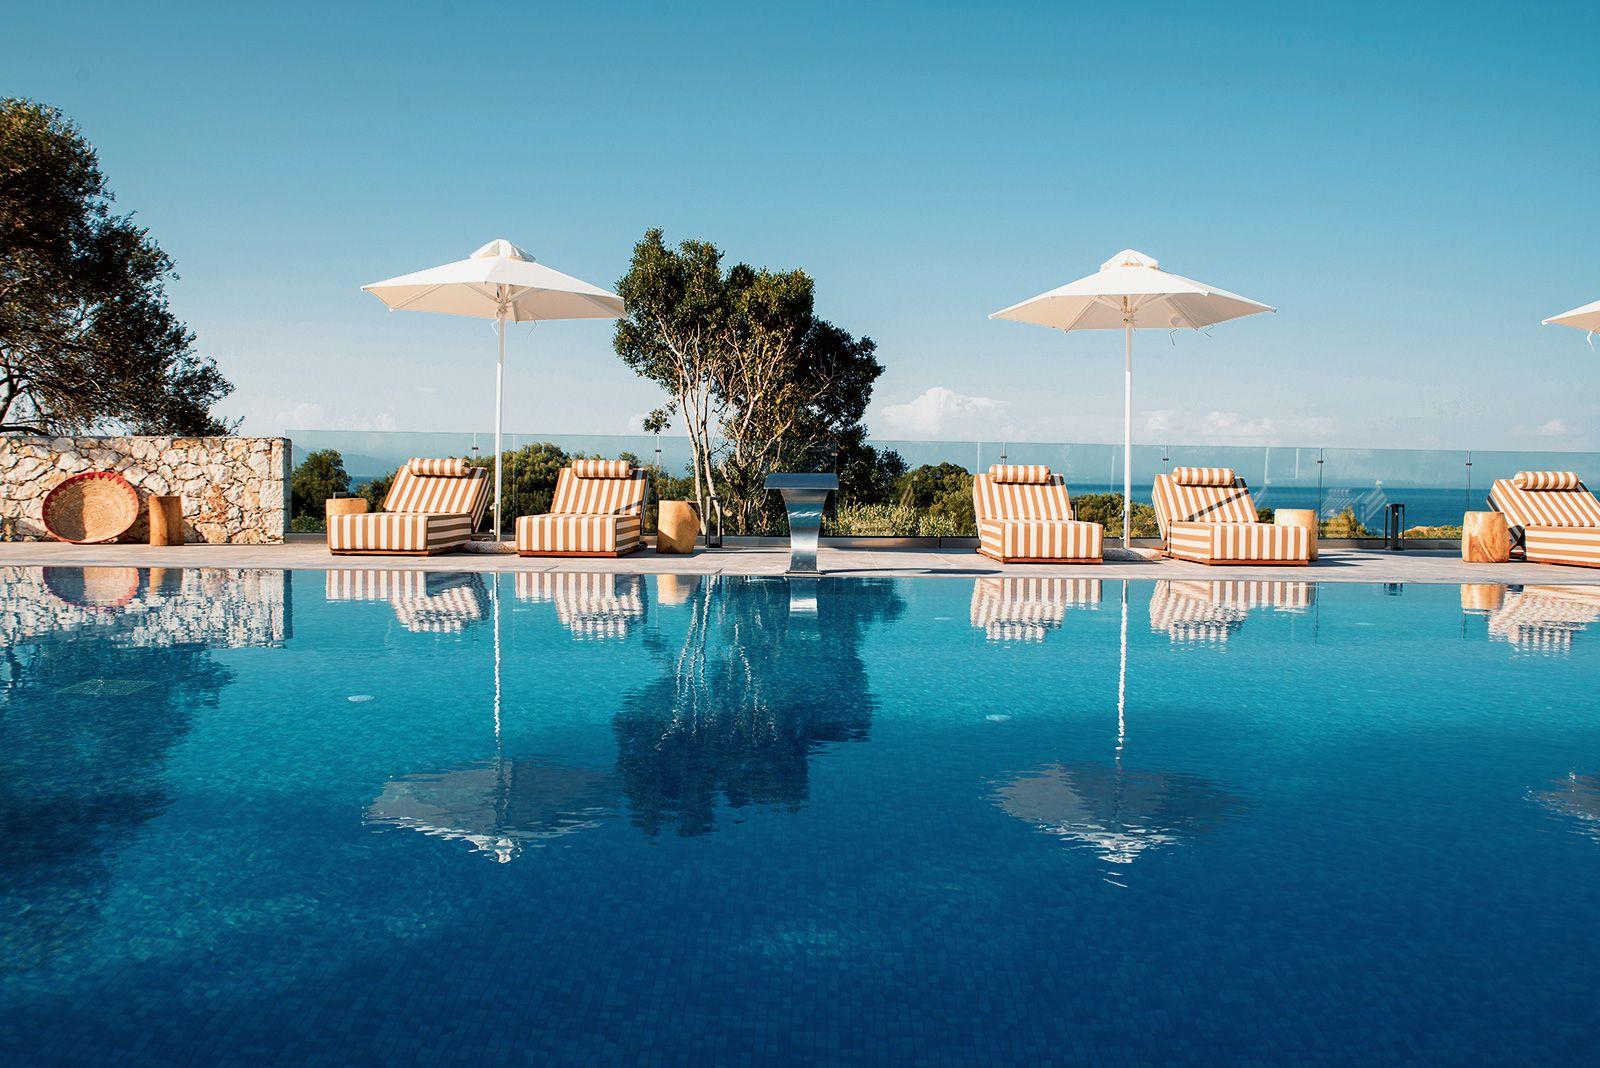 4* Aliv Stone Suites & Spa Zakynthos - Ζάκυνθος ✦ 4 Ημέρες (3 Διανυκτερεύσεις) ✦ 2 άτομα ✦ Πρωινό ✦ 01/07/2021 έως 31/08/2021 ✦ Υπέροχη Τοποθεσία!